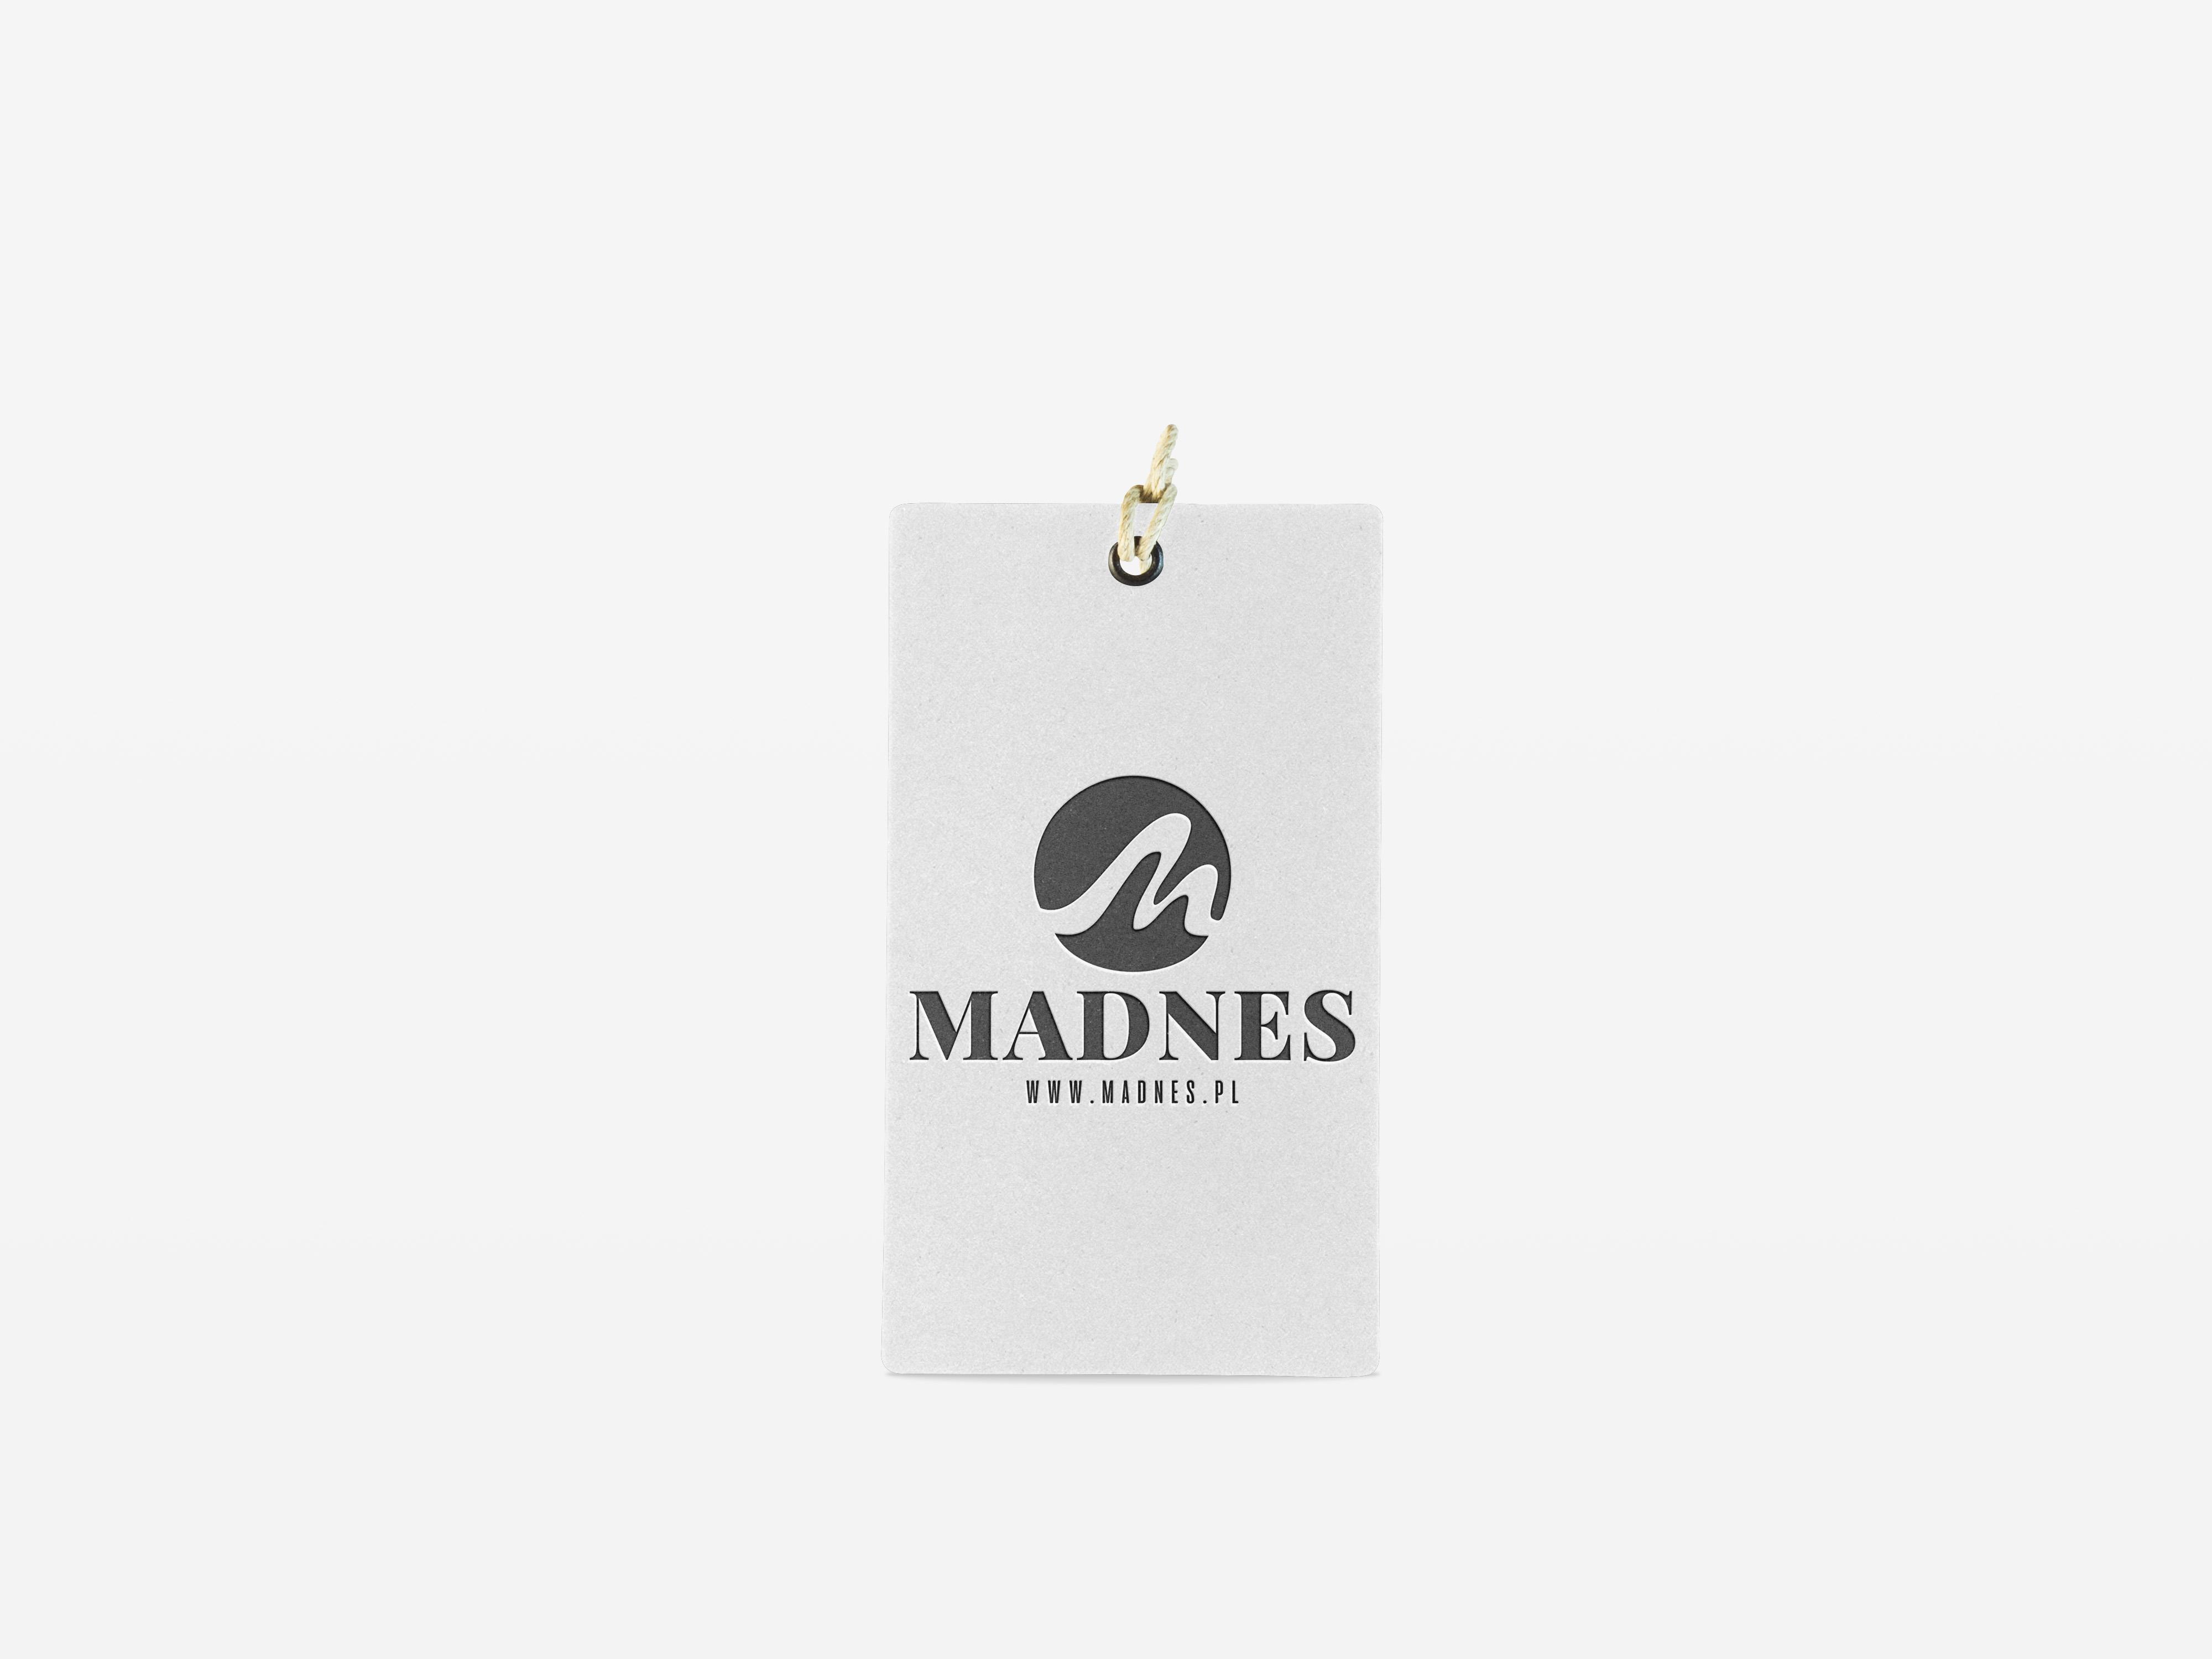 Madnes_branding_1